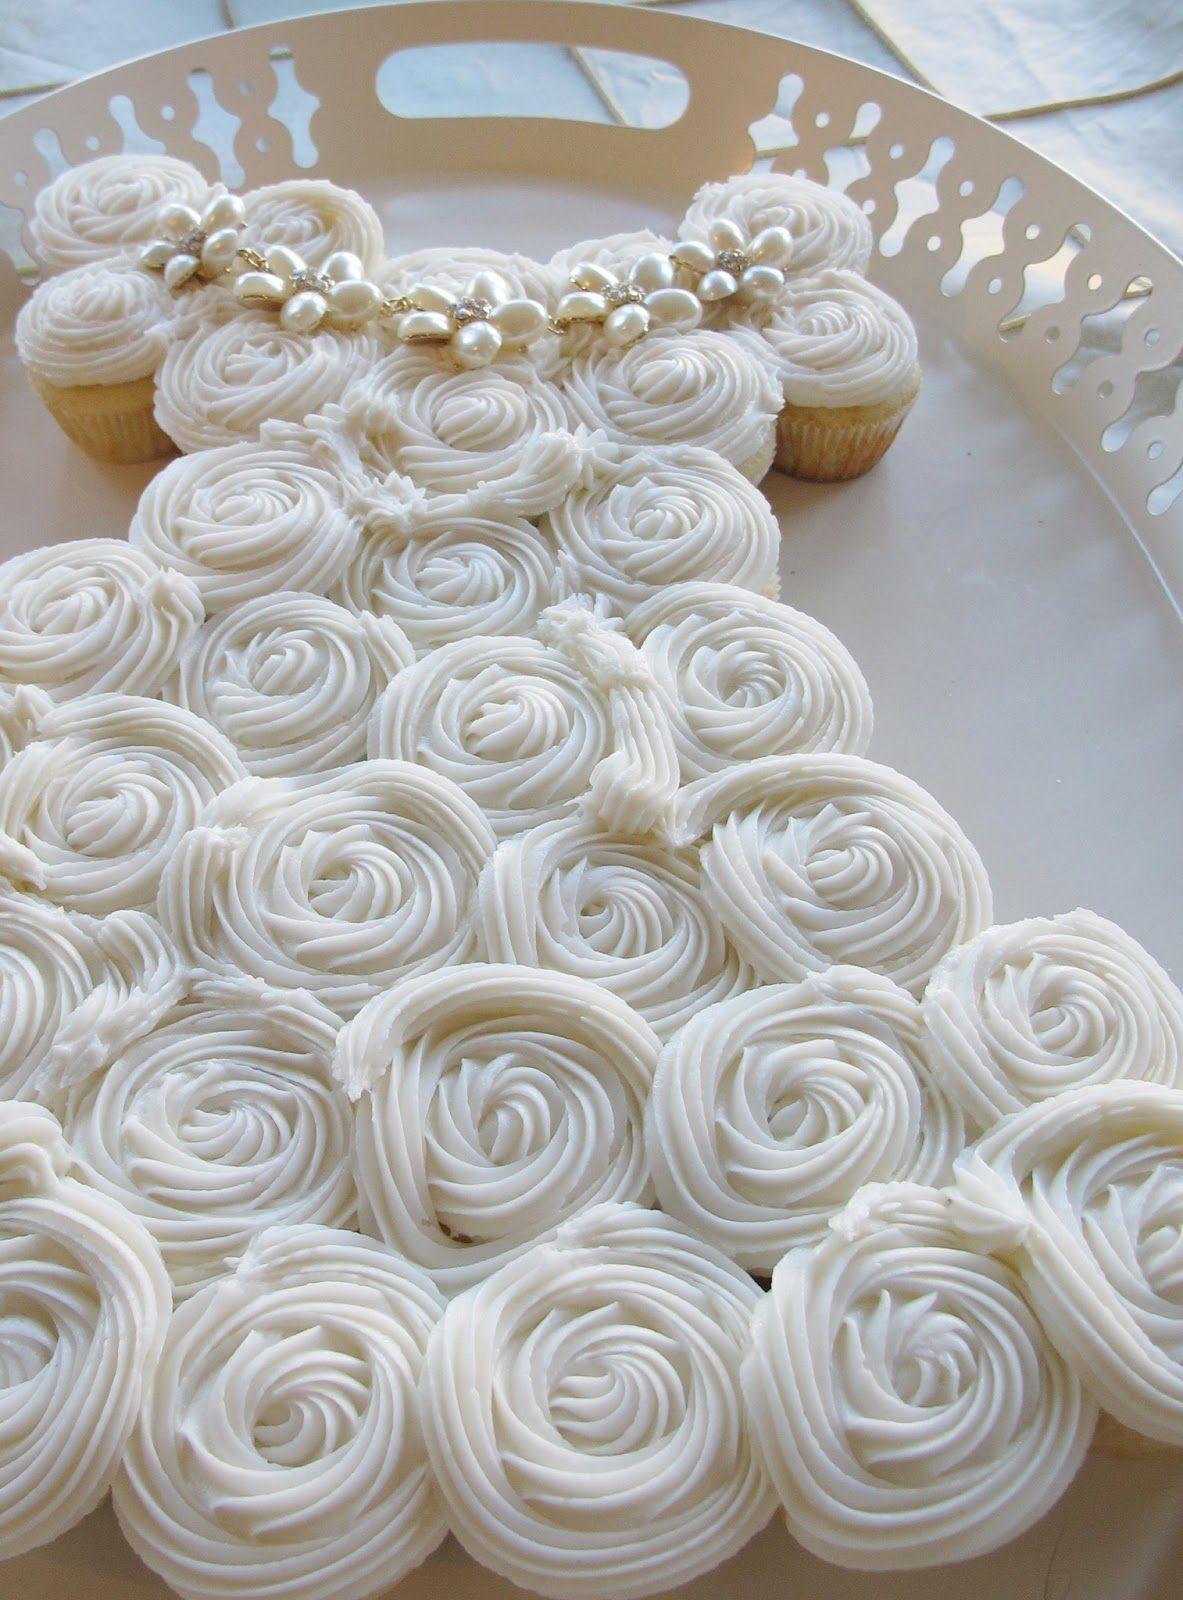 Wedding Wedding Dress Cupcake Cake wedding dress cupcake cake cupcakes everything share cake